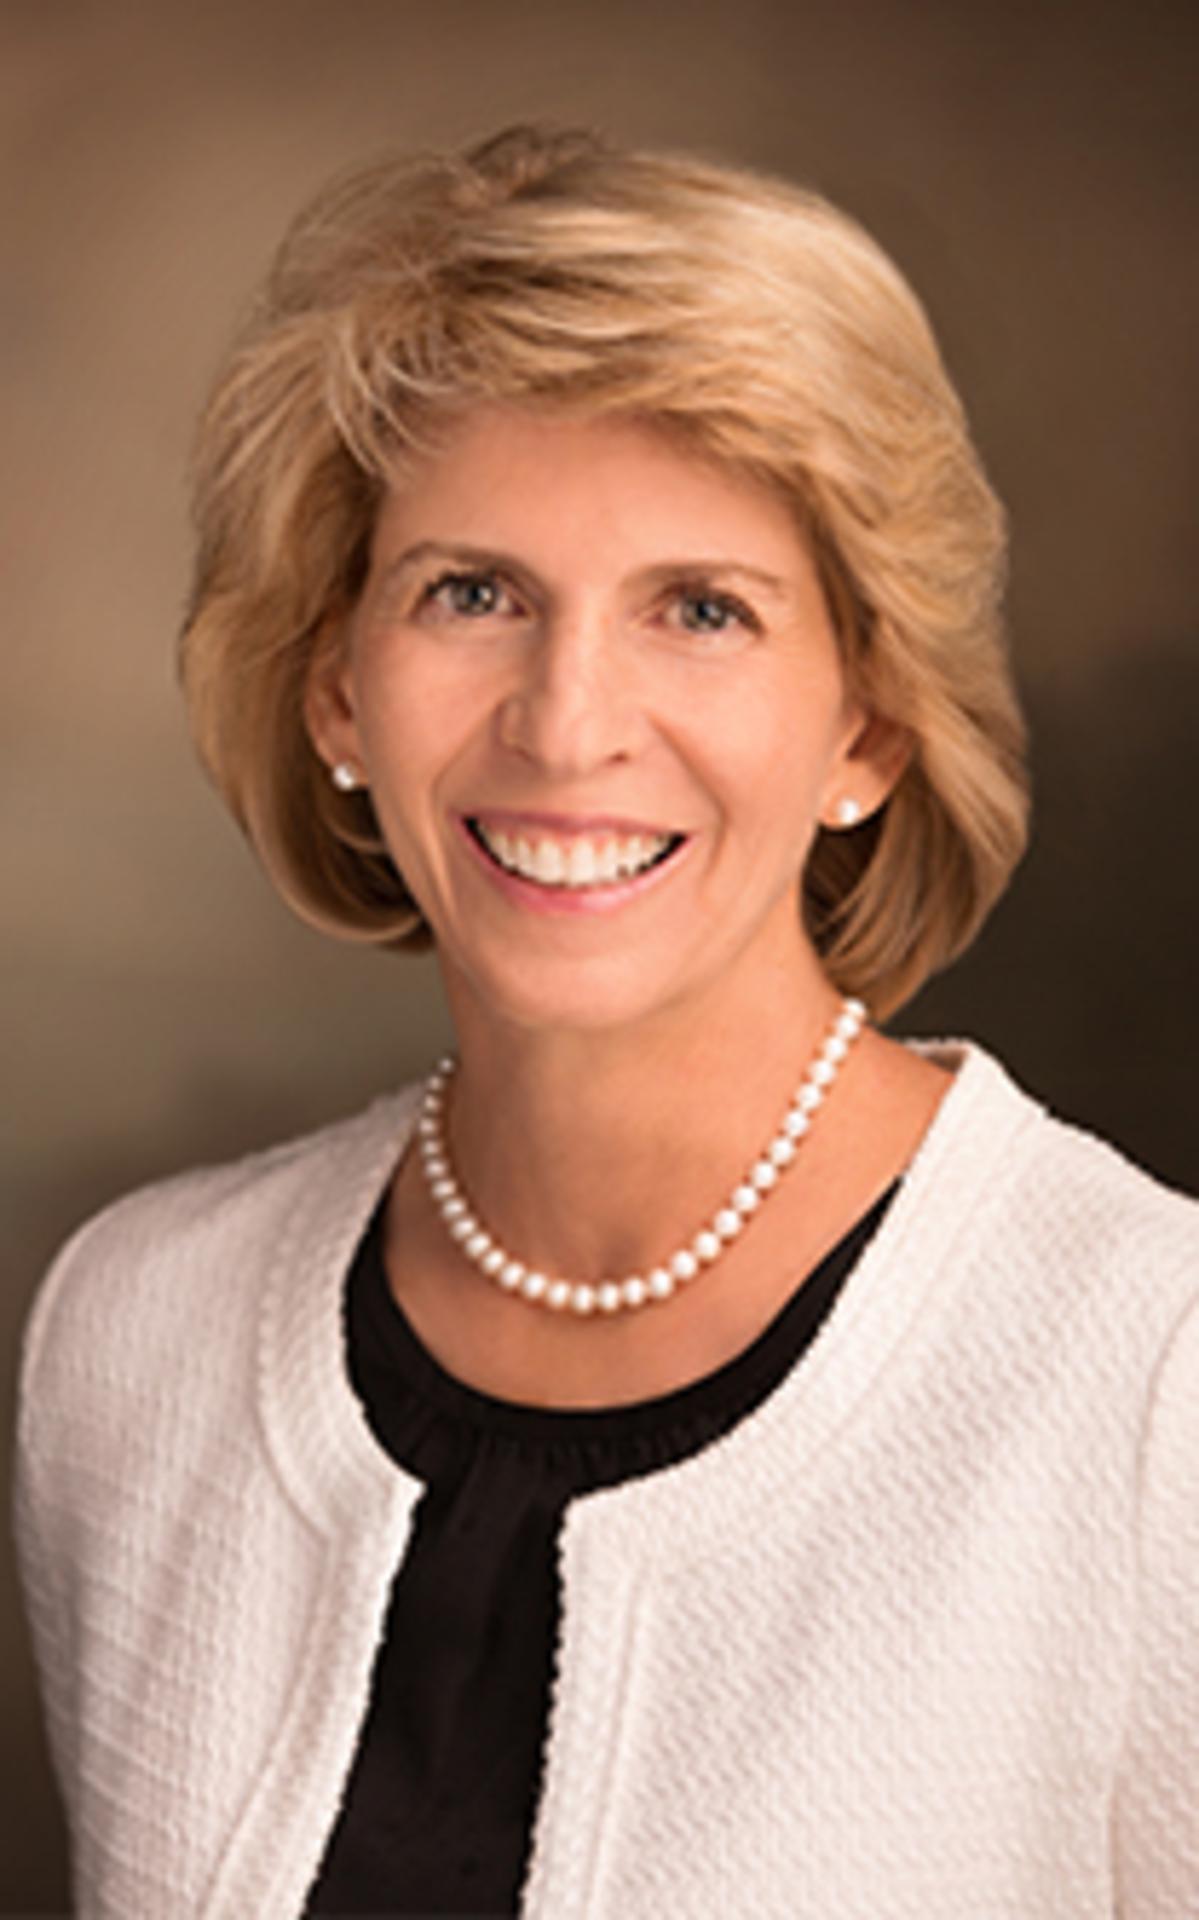 image of Carol F. McConkie